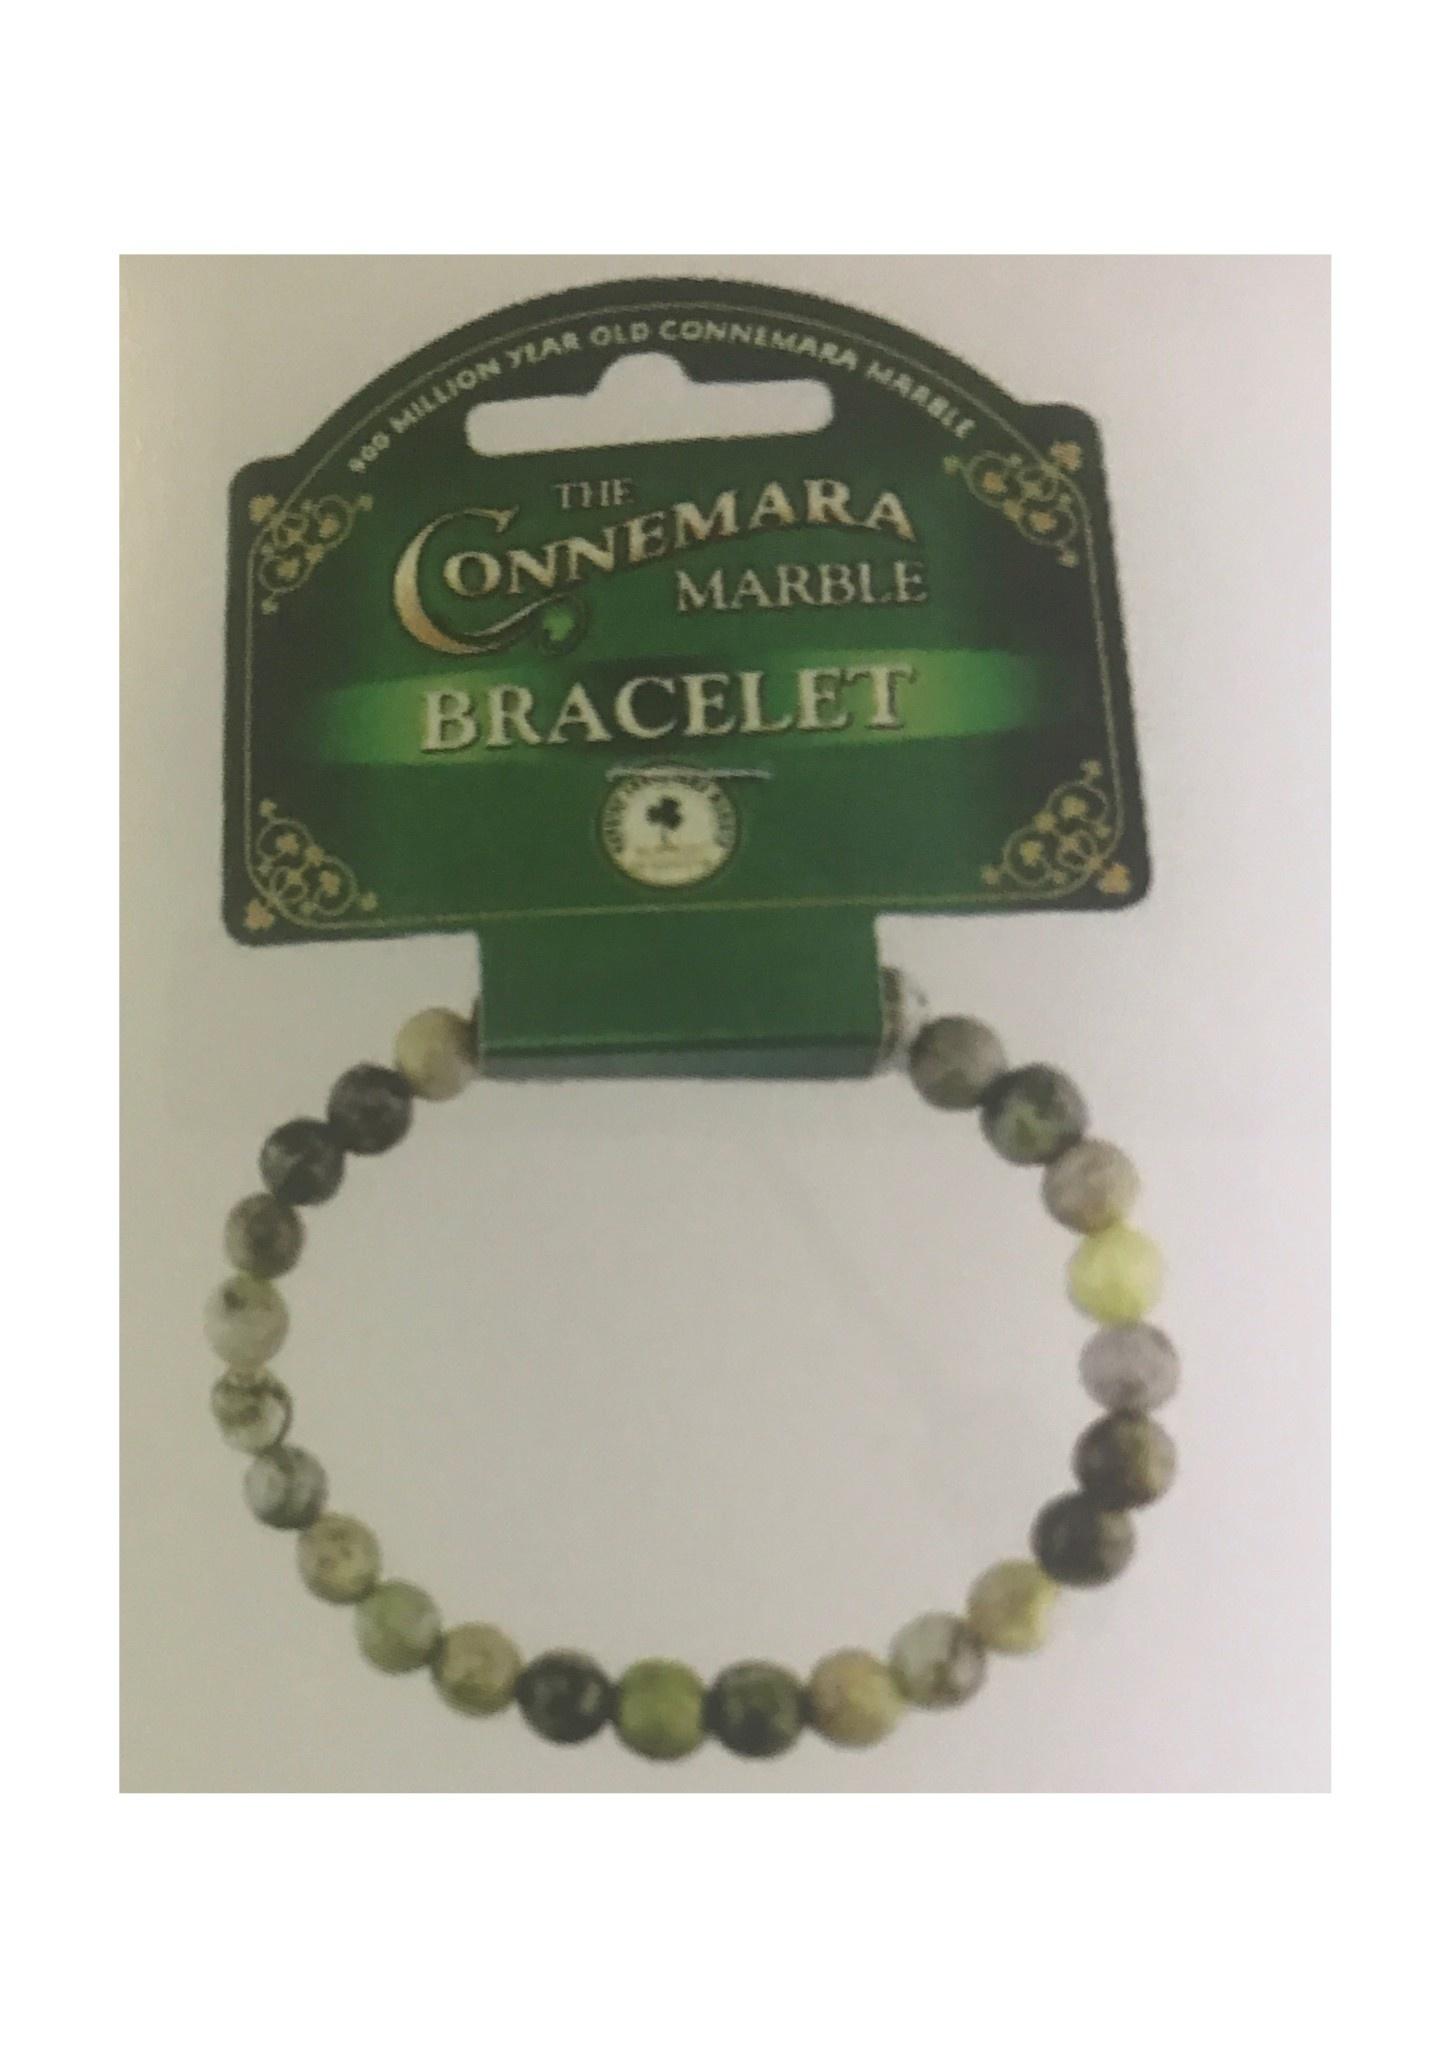 Connemara Marble Bracelet: Connemara Marble, Large Bead